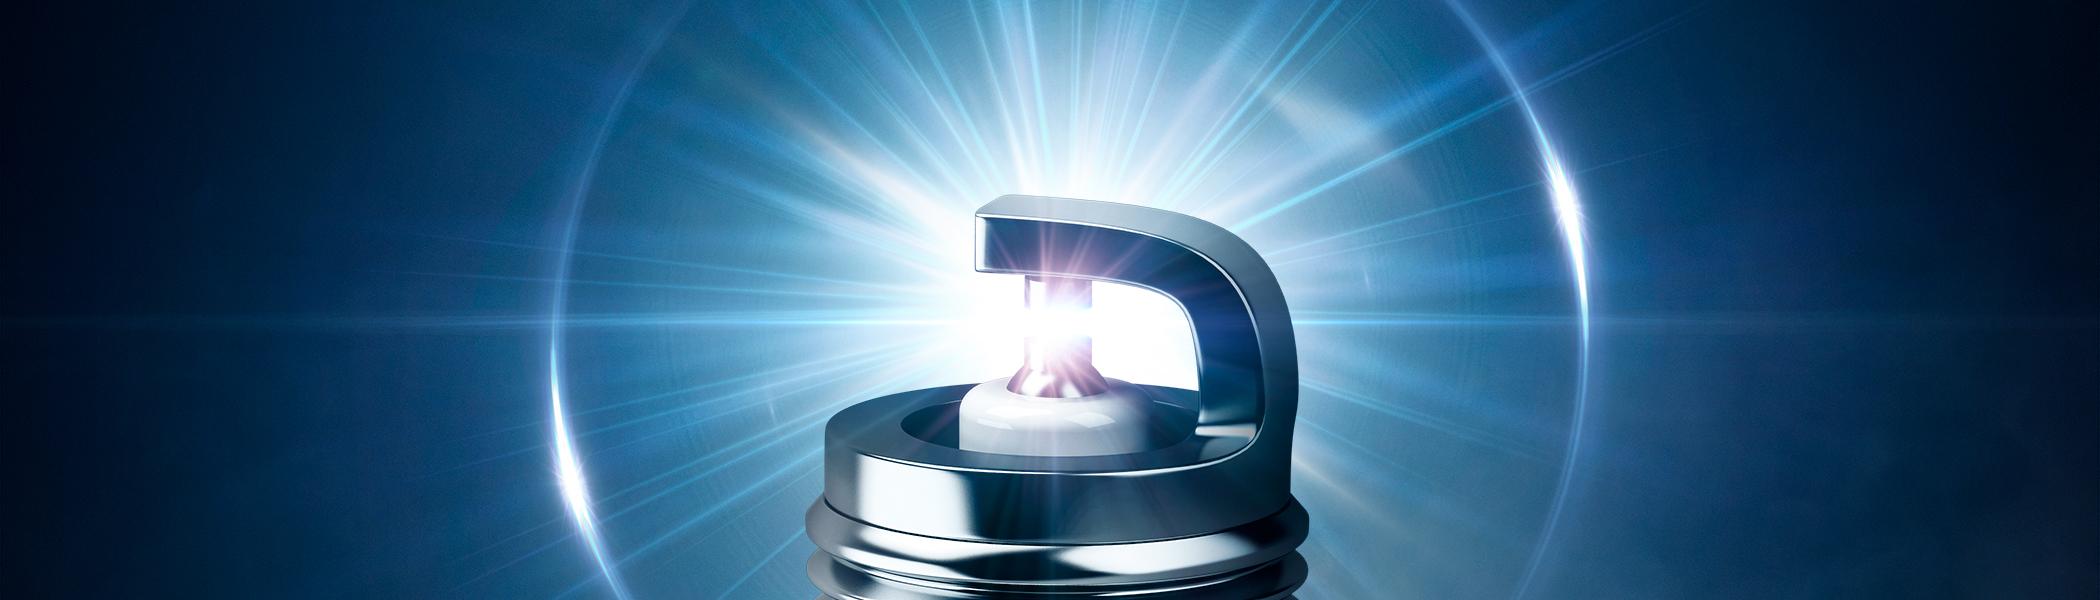 SPARK_PLUG_header-2100x600.jpg